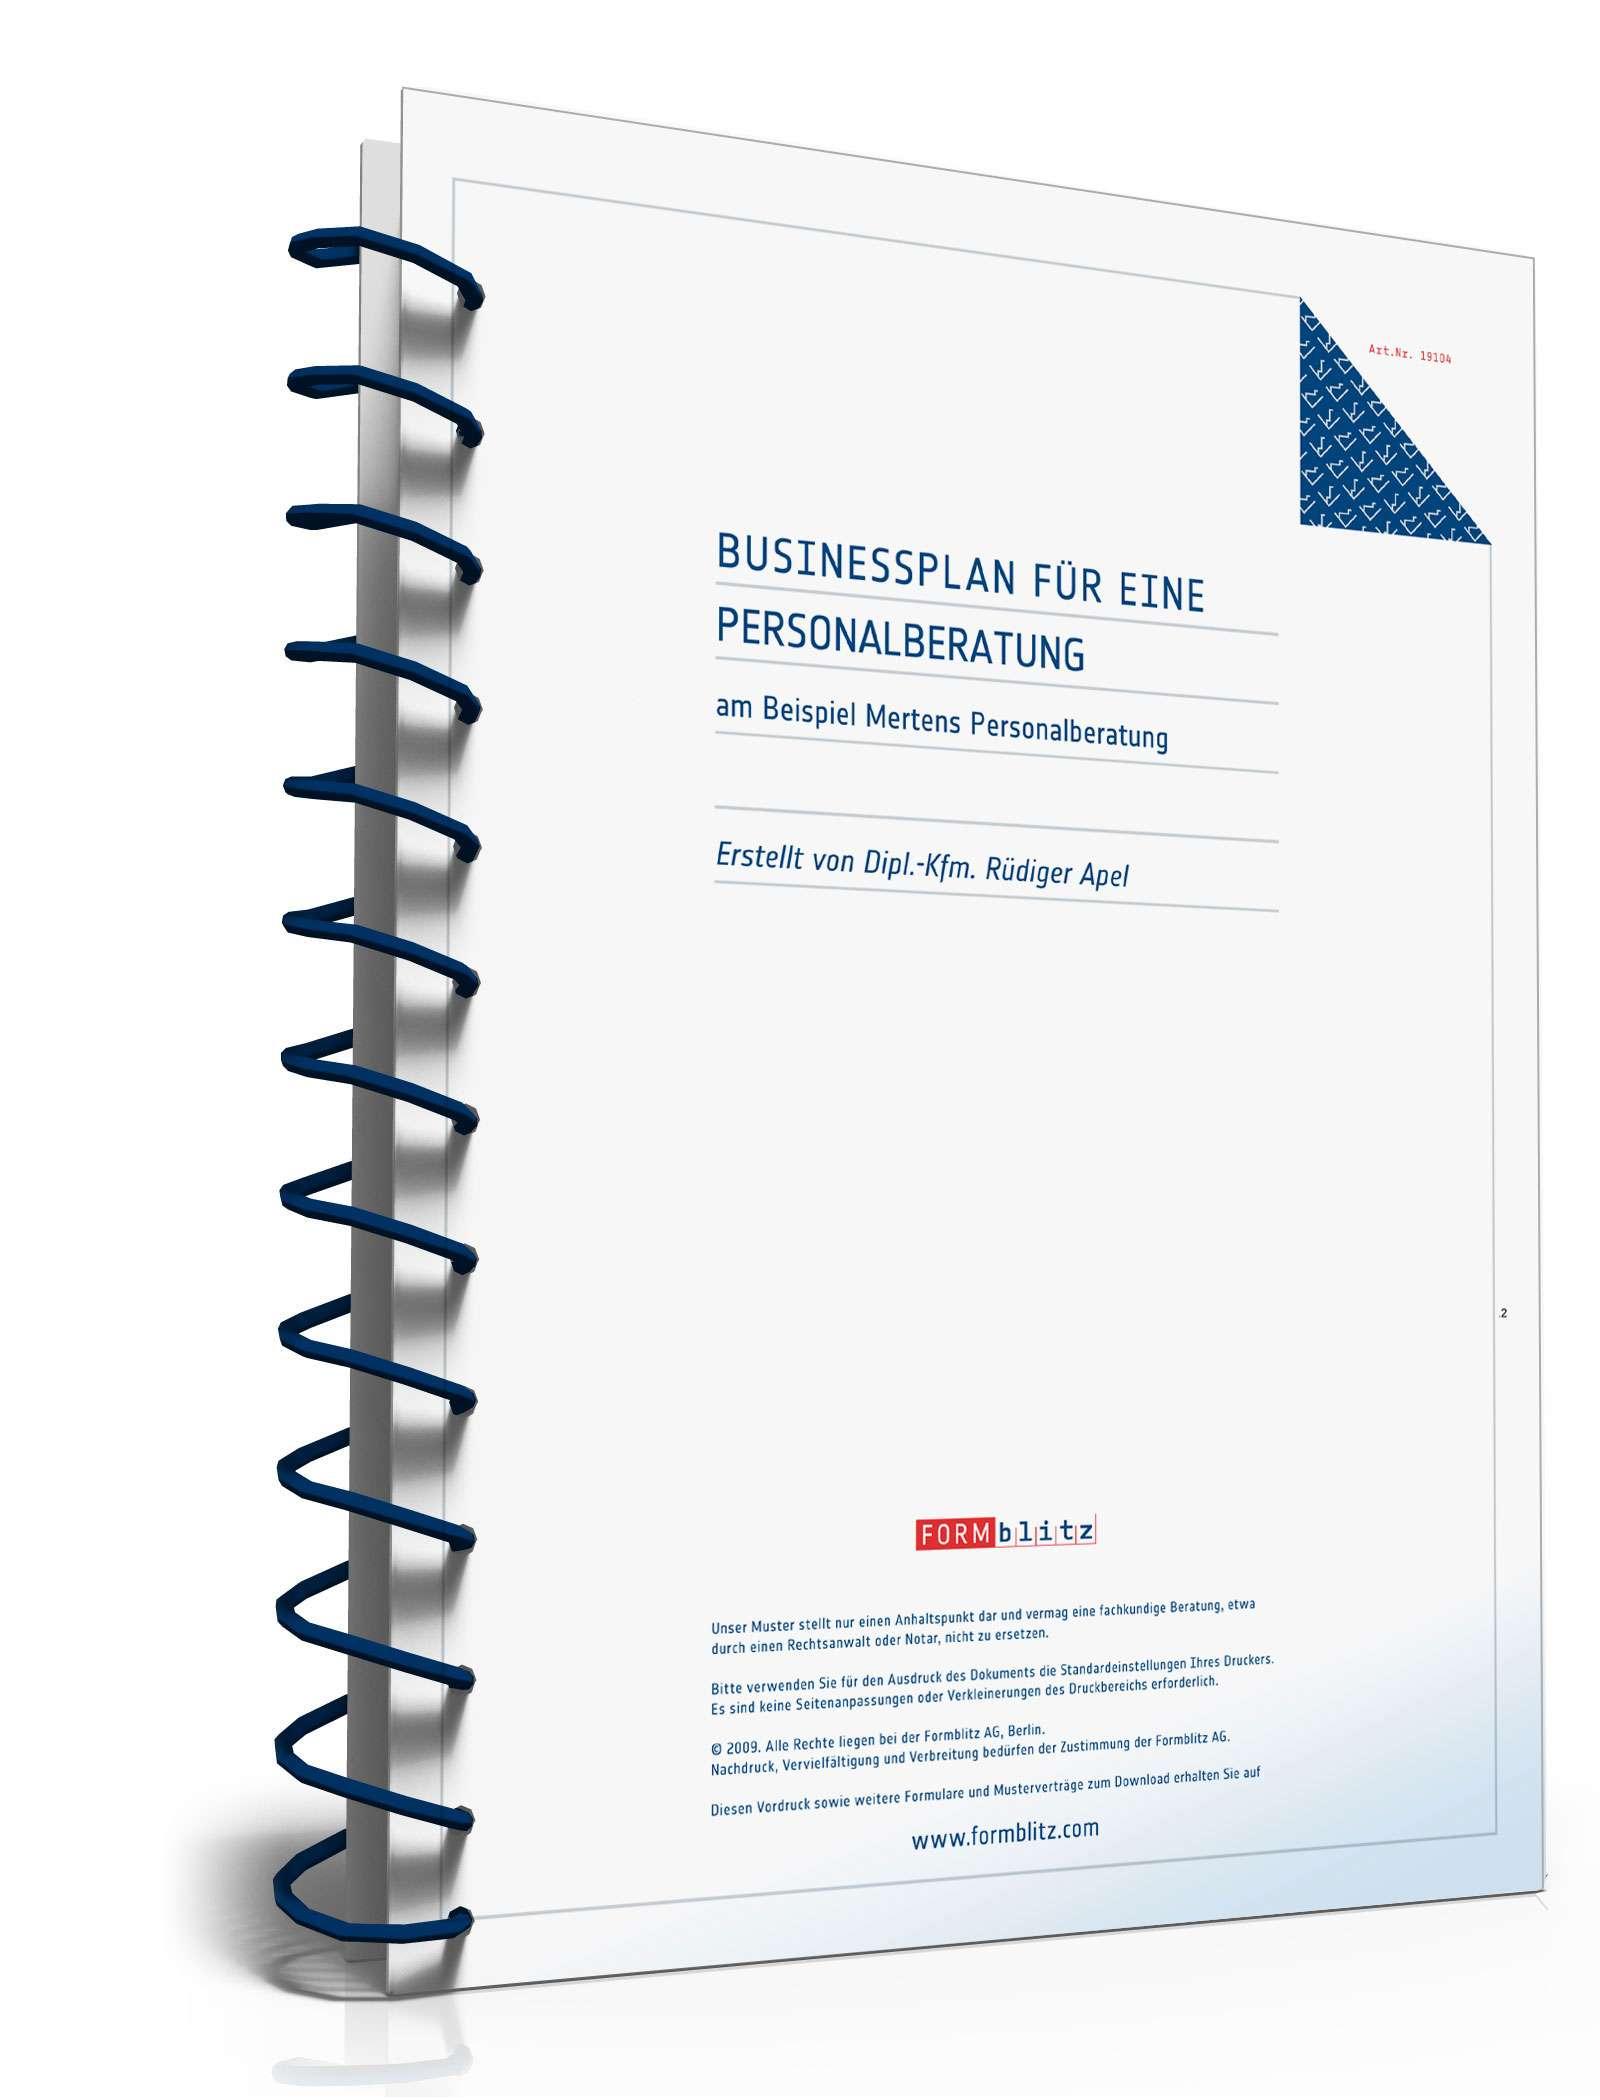 Businessplan Personalberatung | Muster zum Download